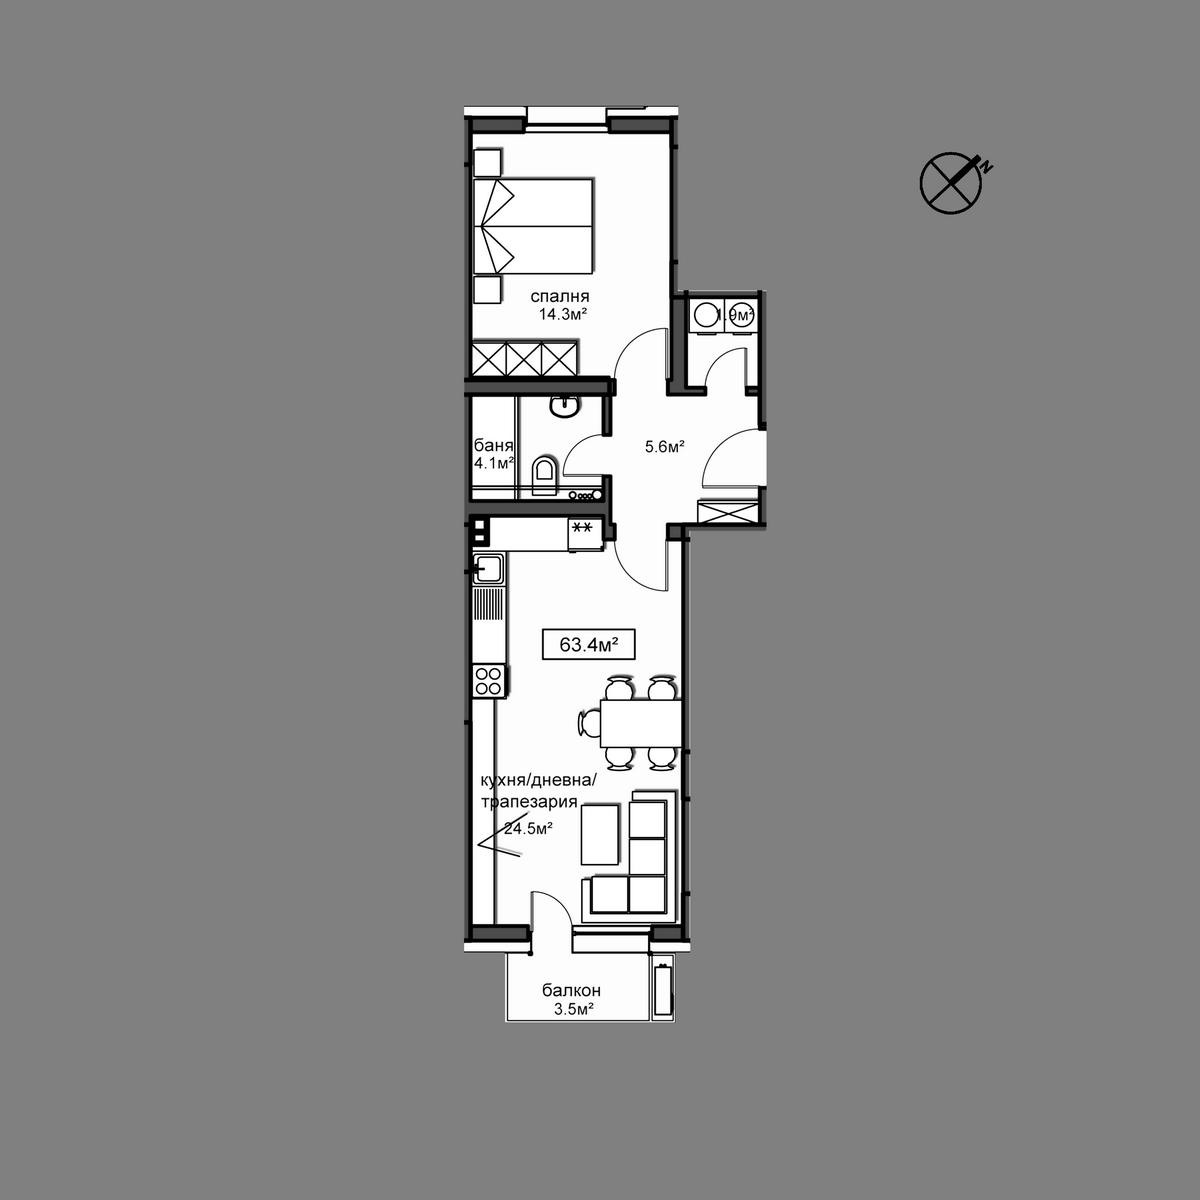 Продава апартамент ново строителство - Апартамент  Б15